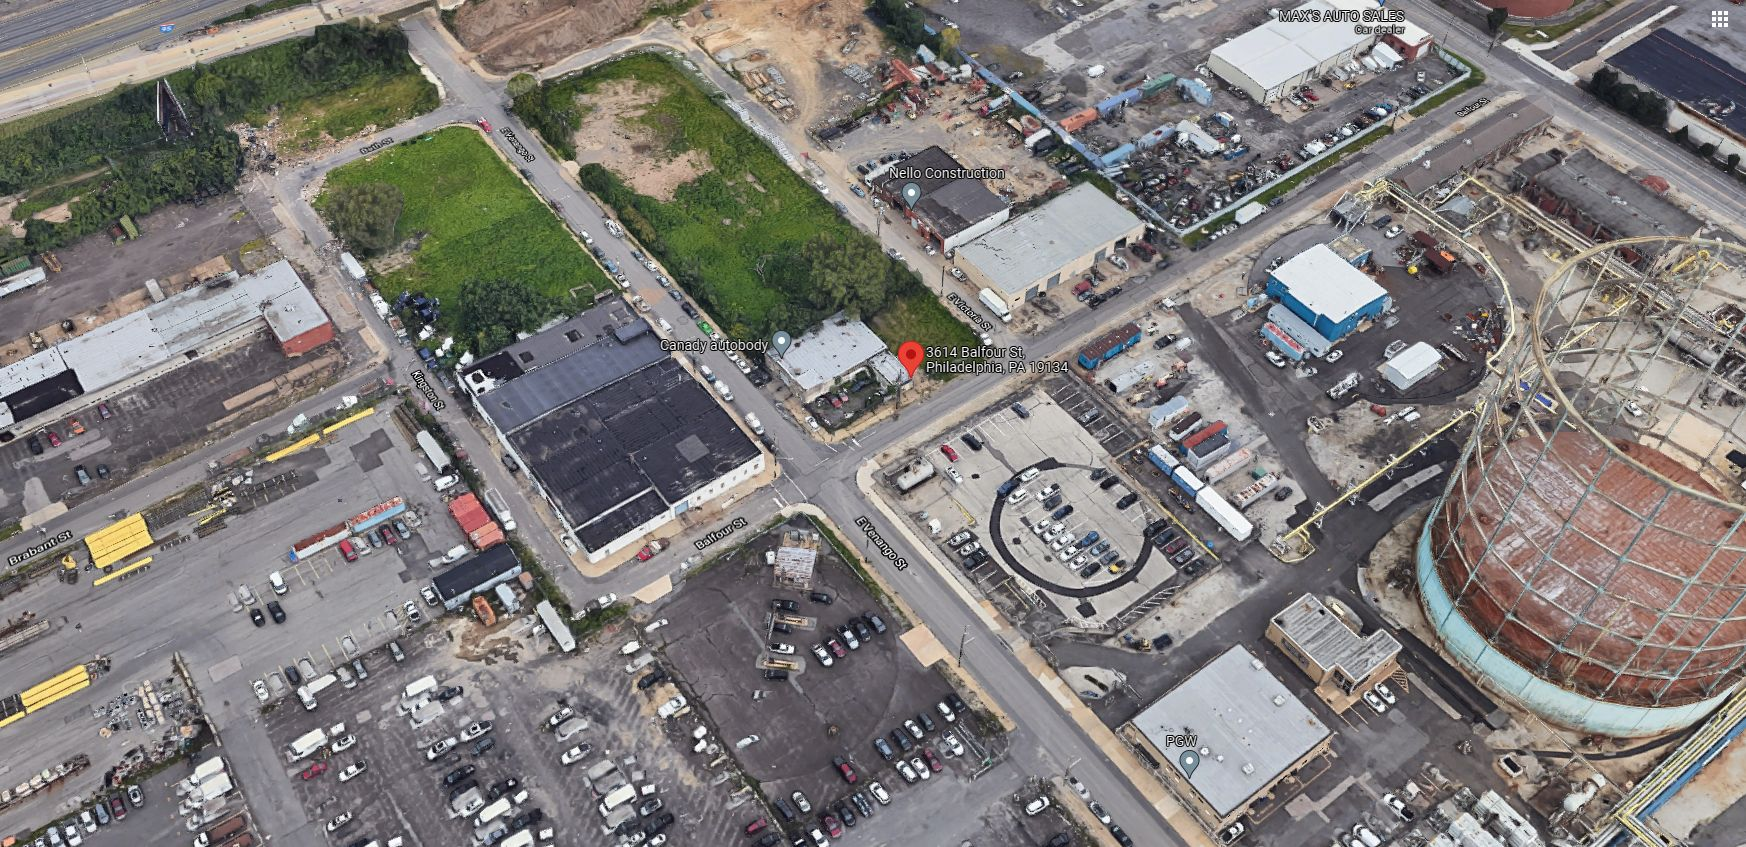 3614 Balfour Street. Looking north. Credit: Google Maps